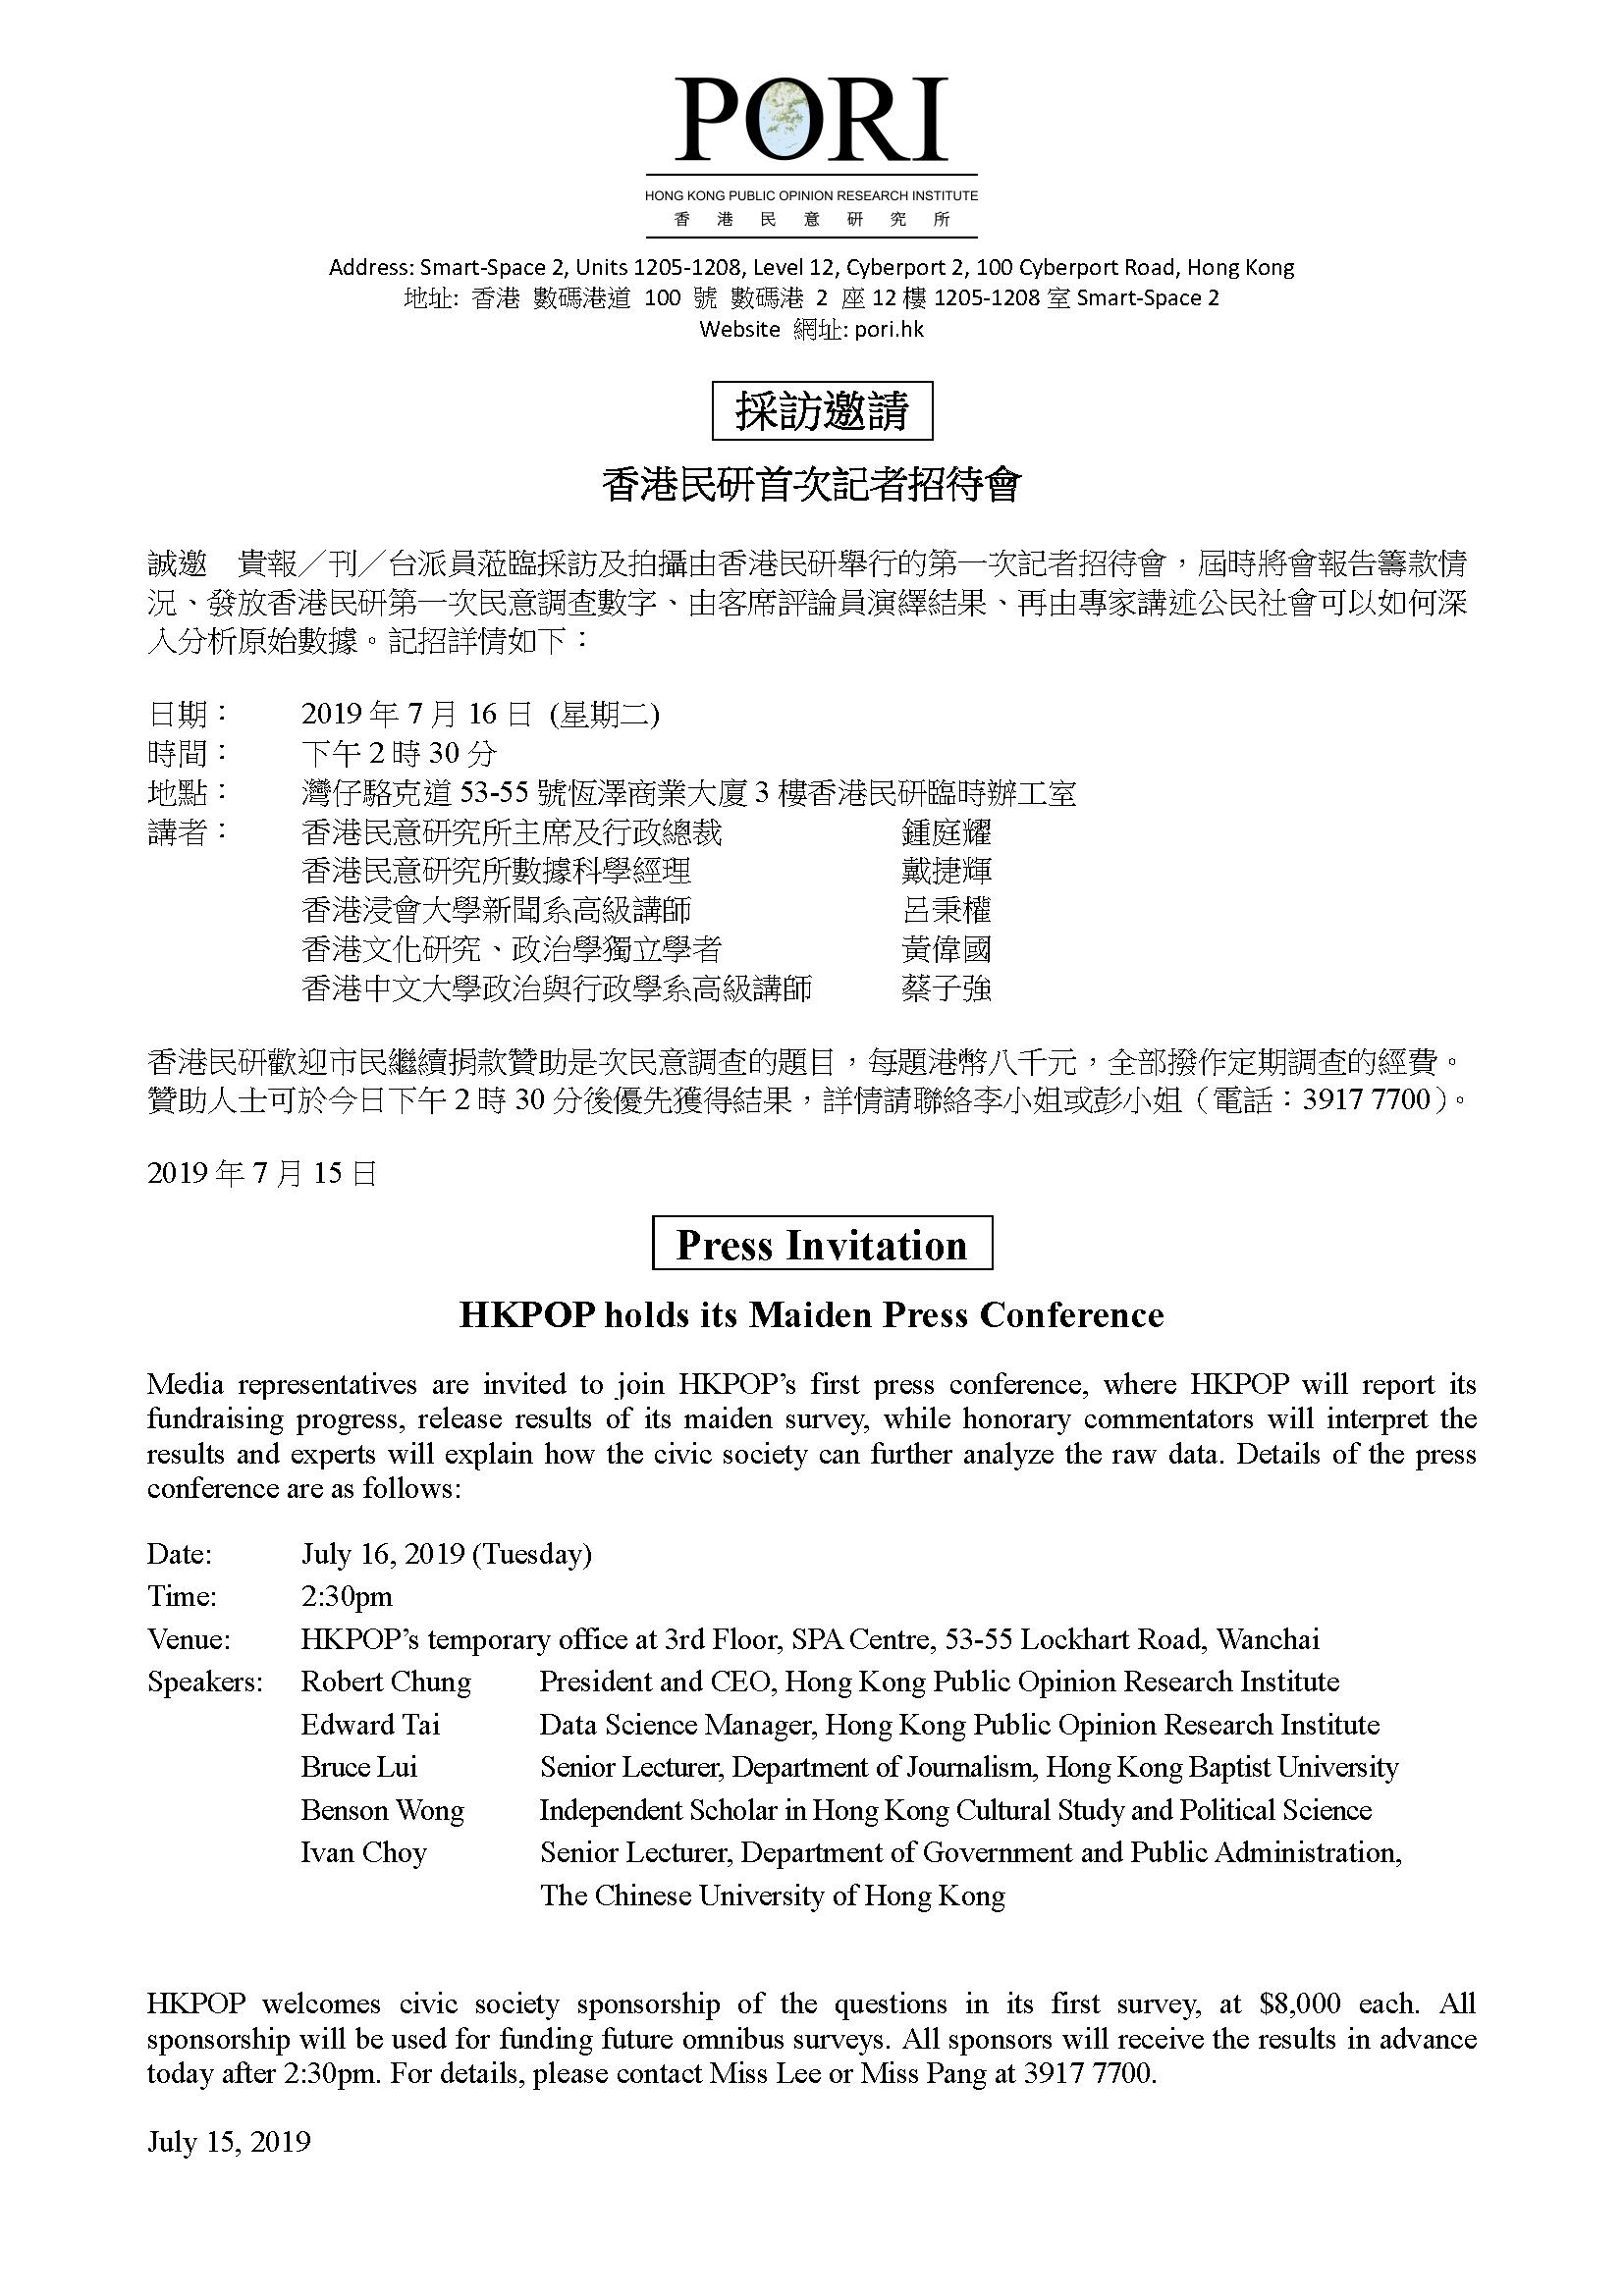 20190716_first tp release_press invite_v1_HKPOP.png